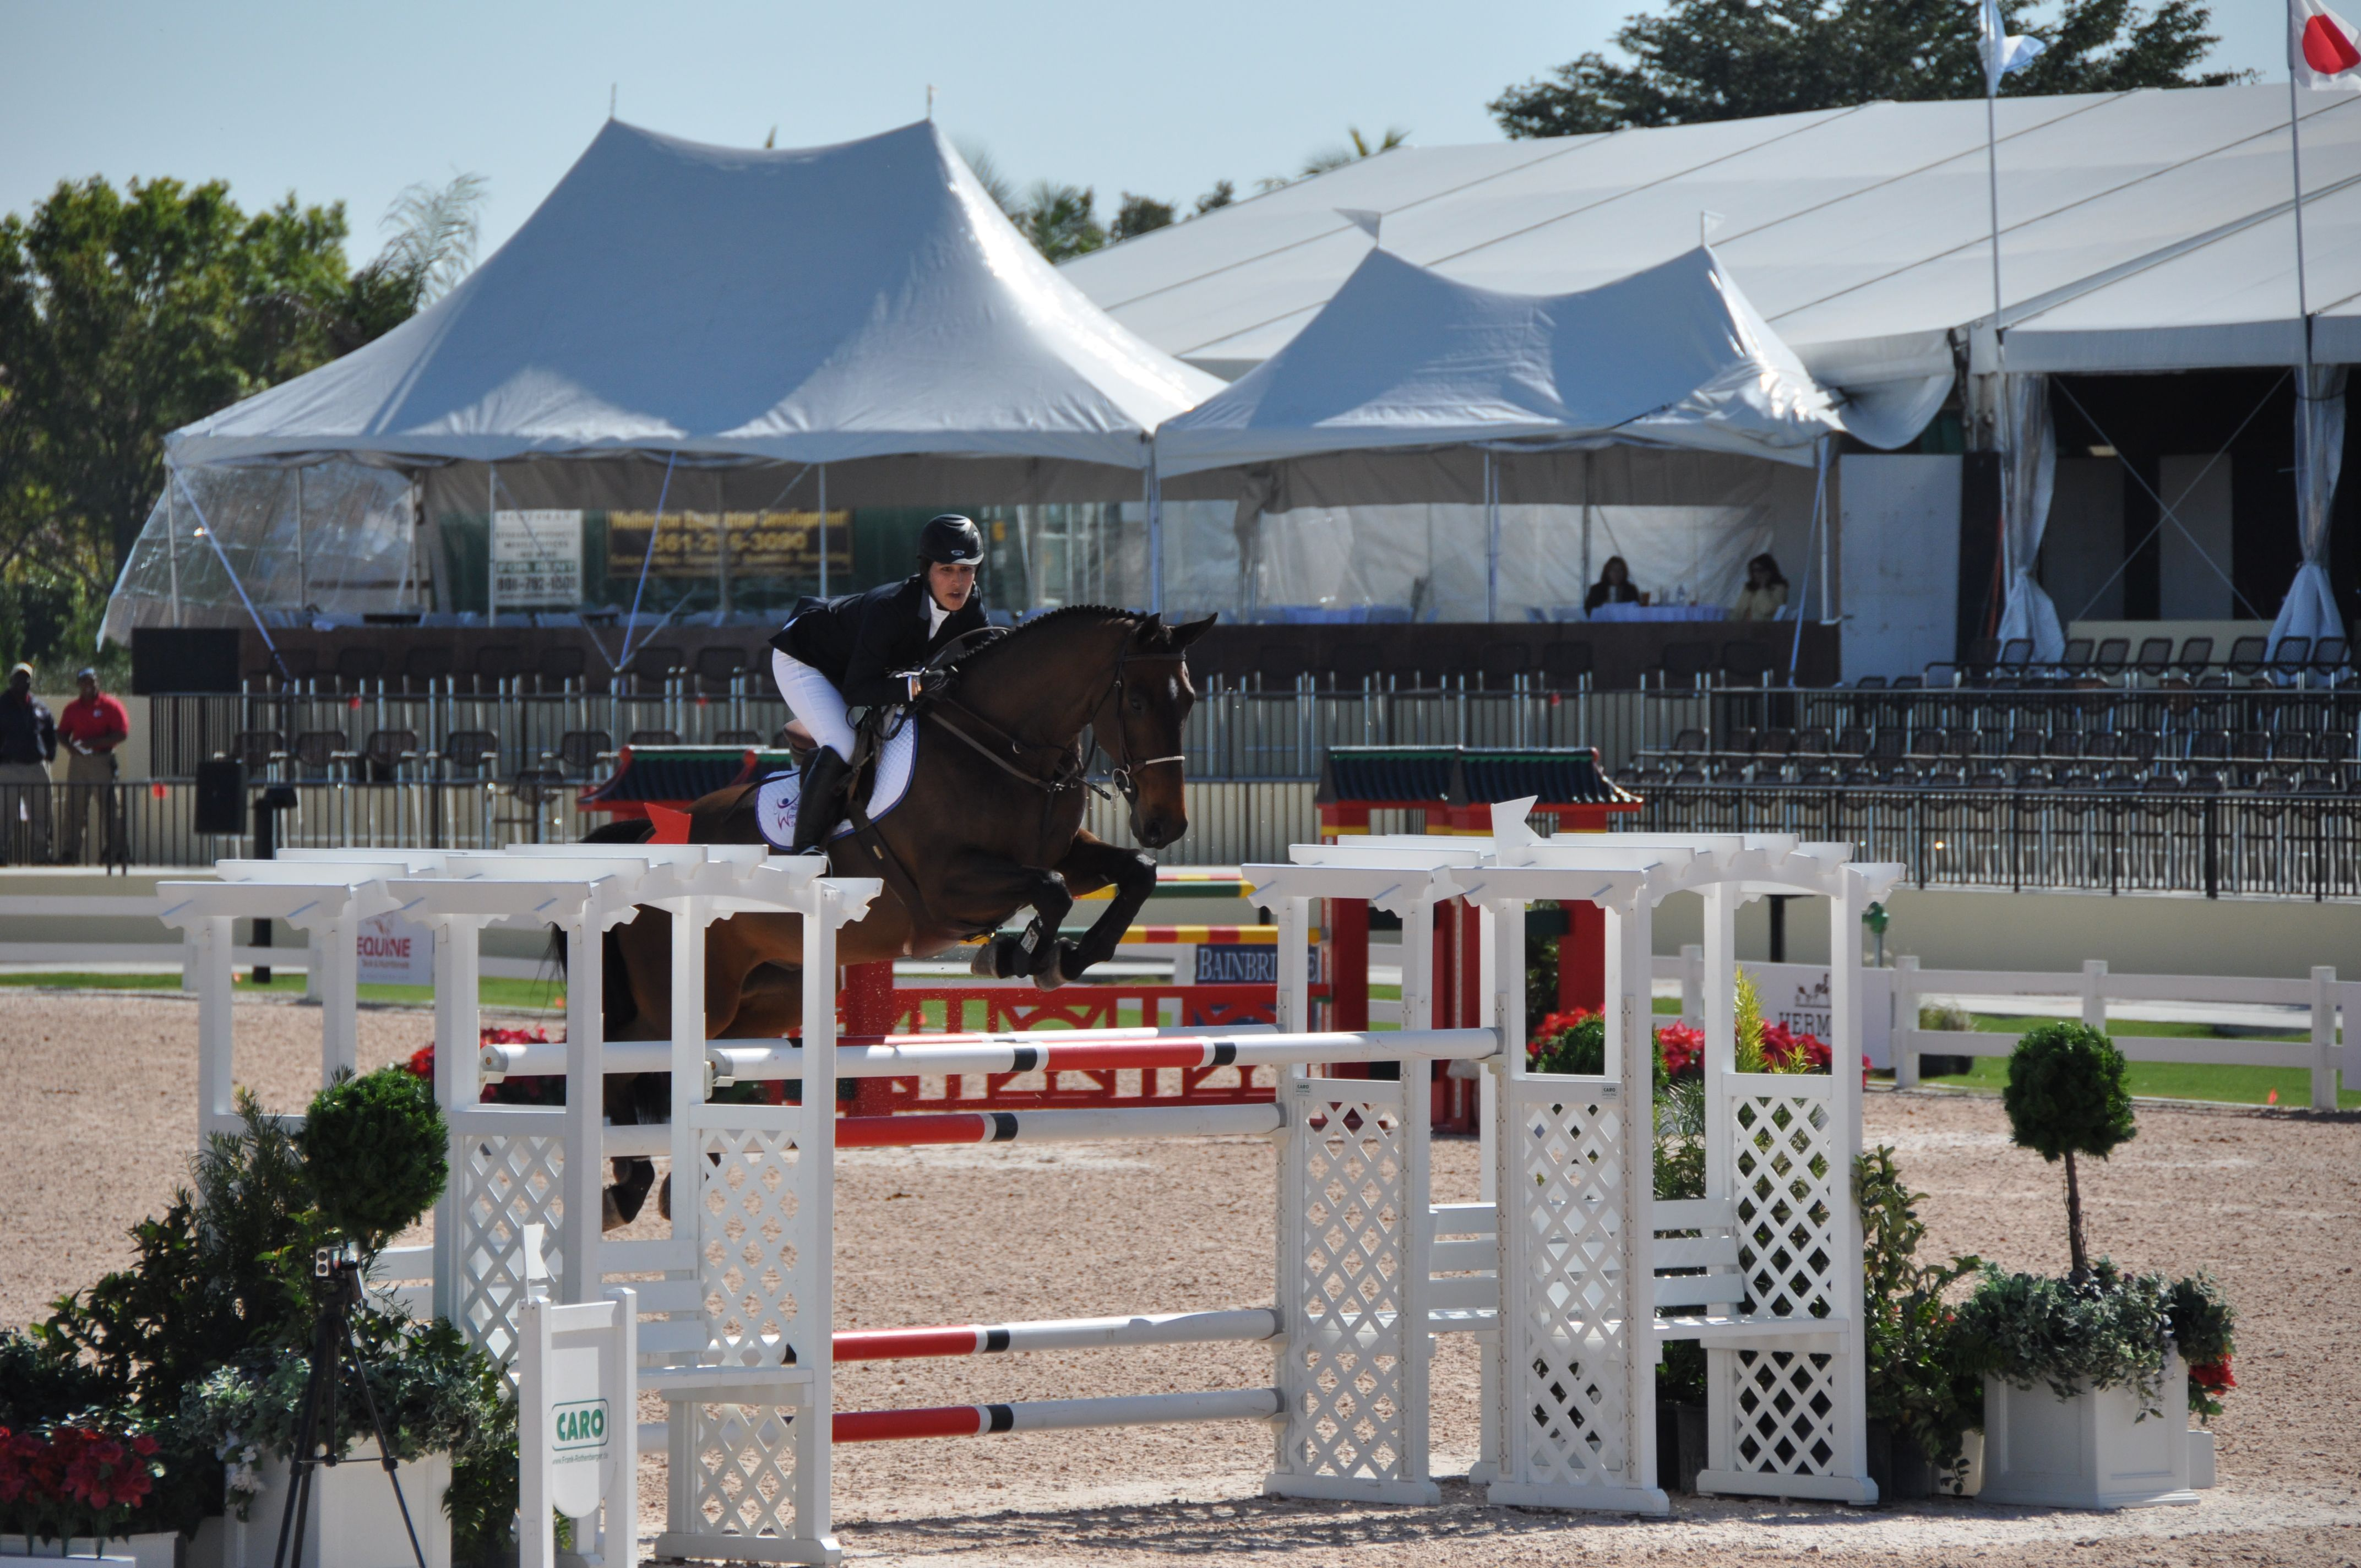 Crown Pointe Equestrian, LLC